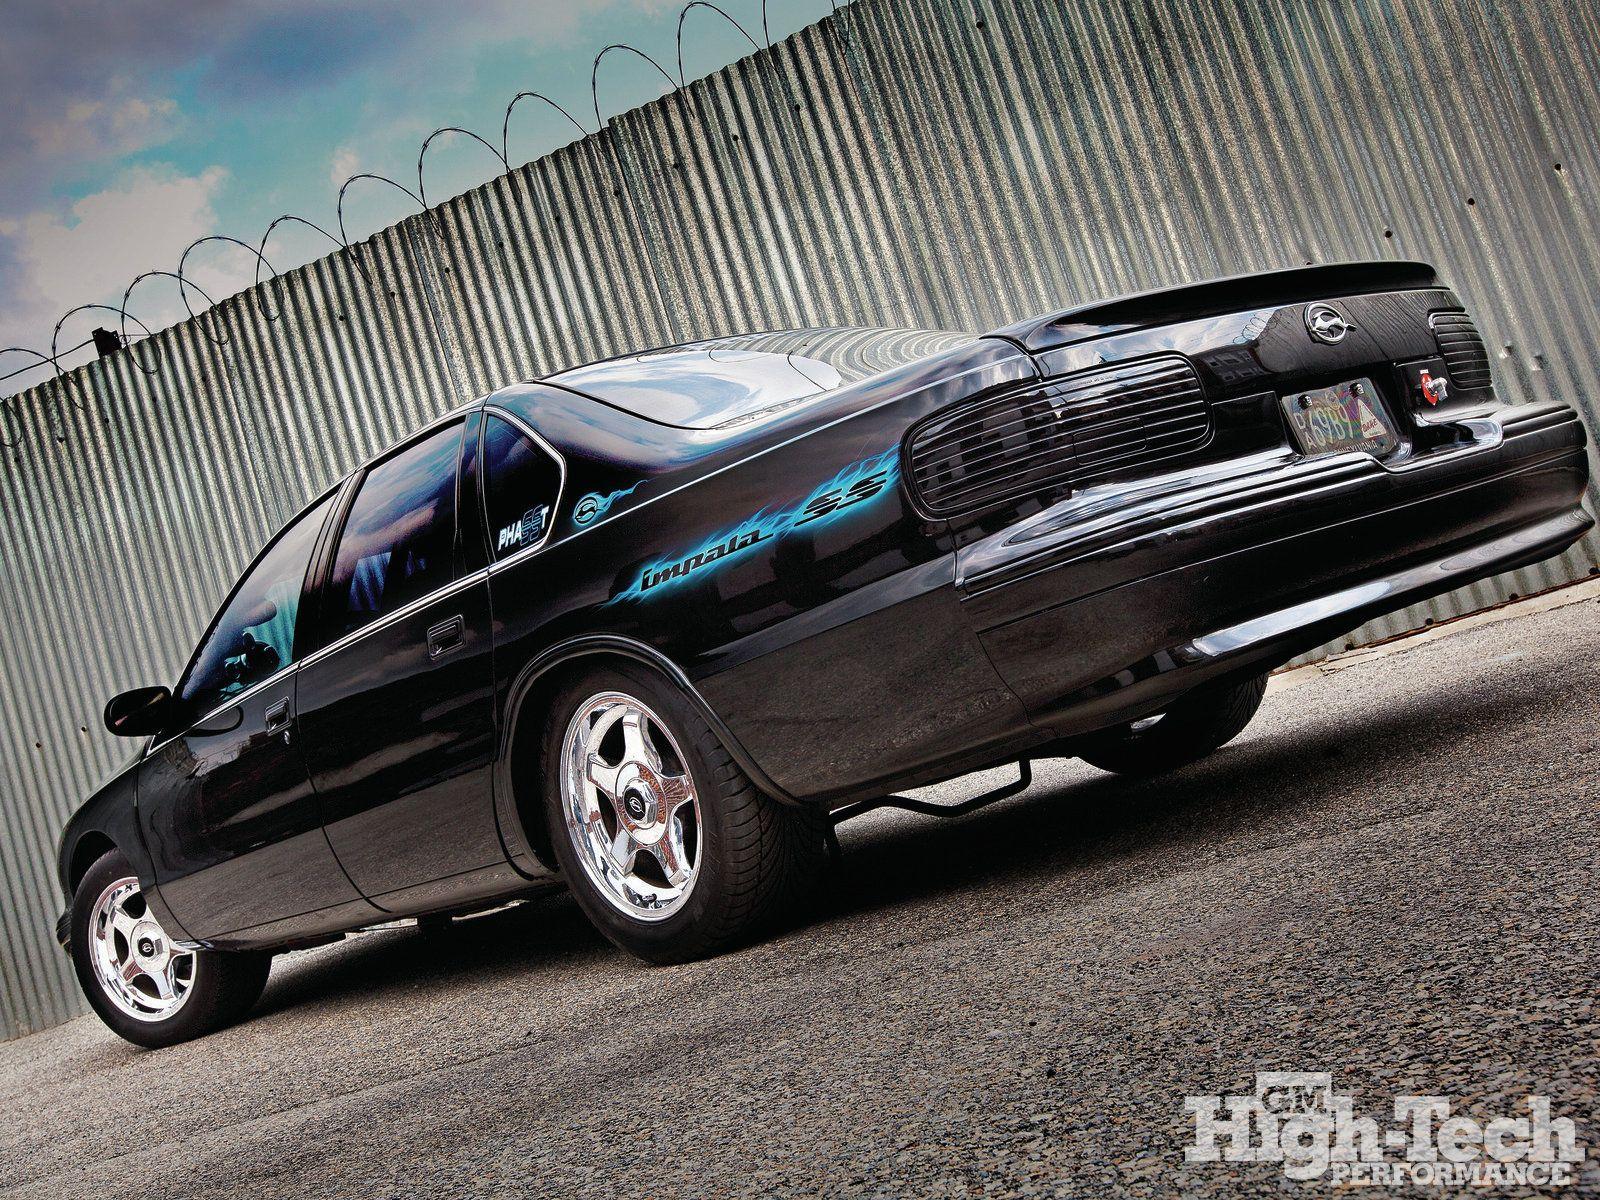 95 chevy impala ss with satin paint http mrimpalasautoparts com 94 96 chevrolet impala ss pinterest chevy impala ss chevy impala and impalas